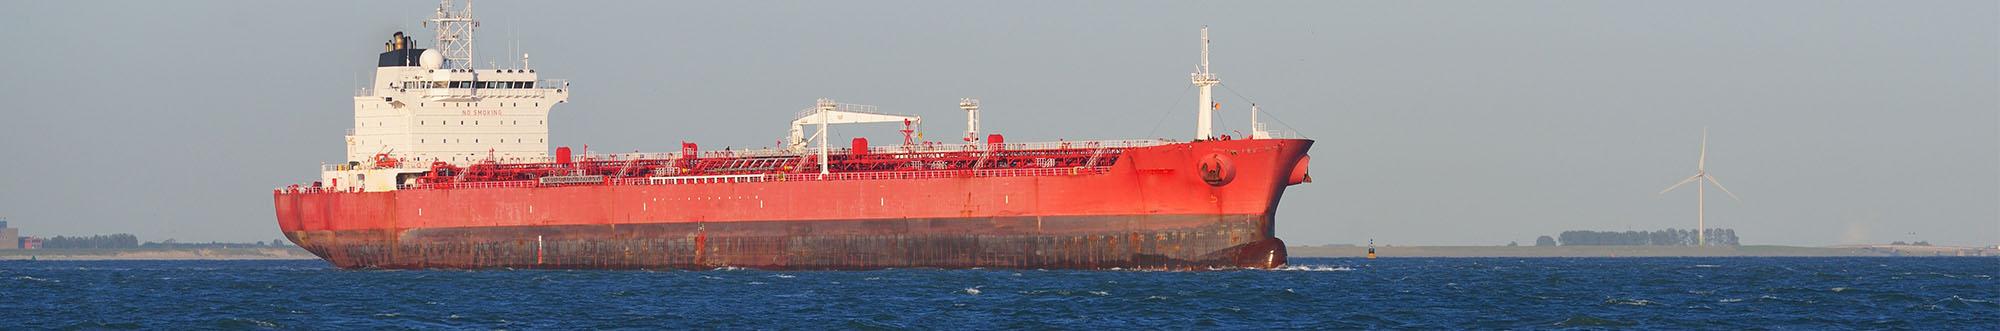 Transfrontier Shipment of Waste